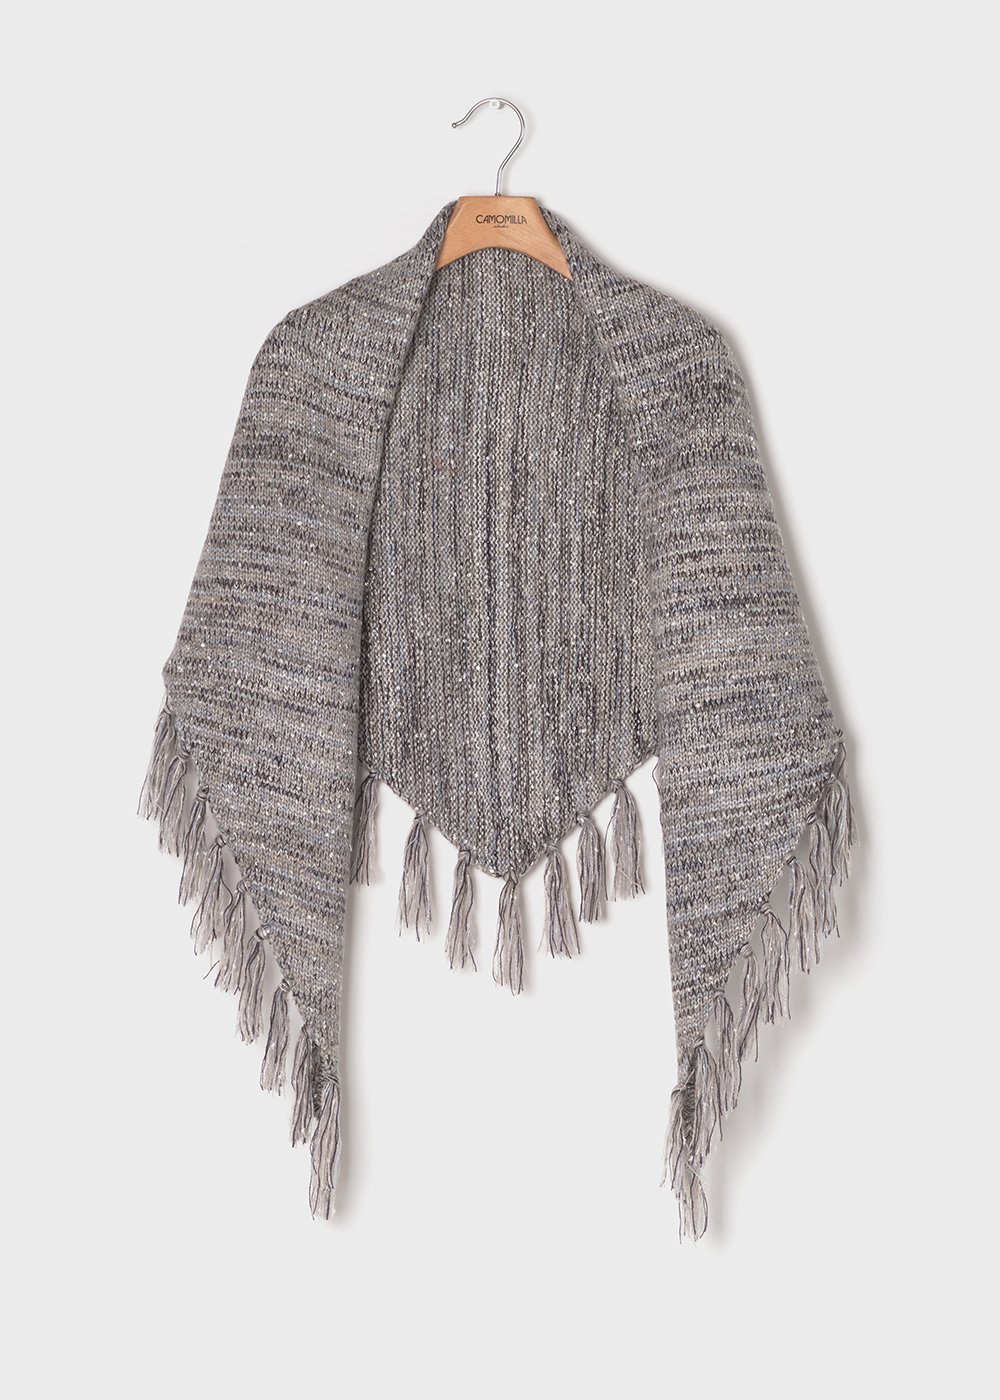 Sayd keffiyeh model scarf with micro-sequins